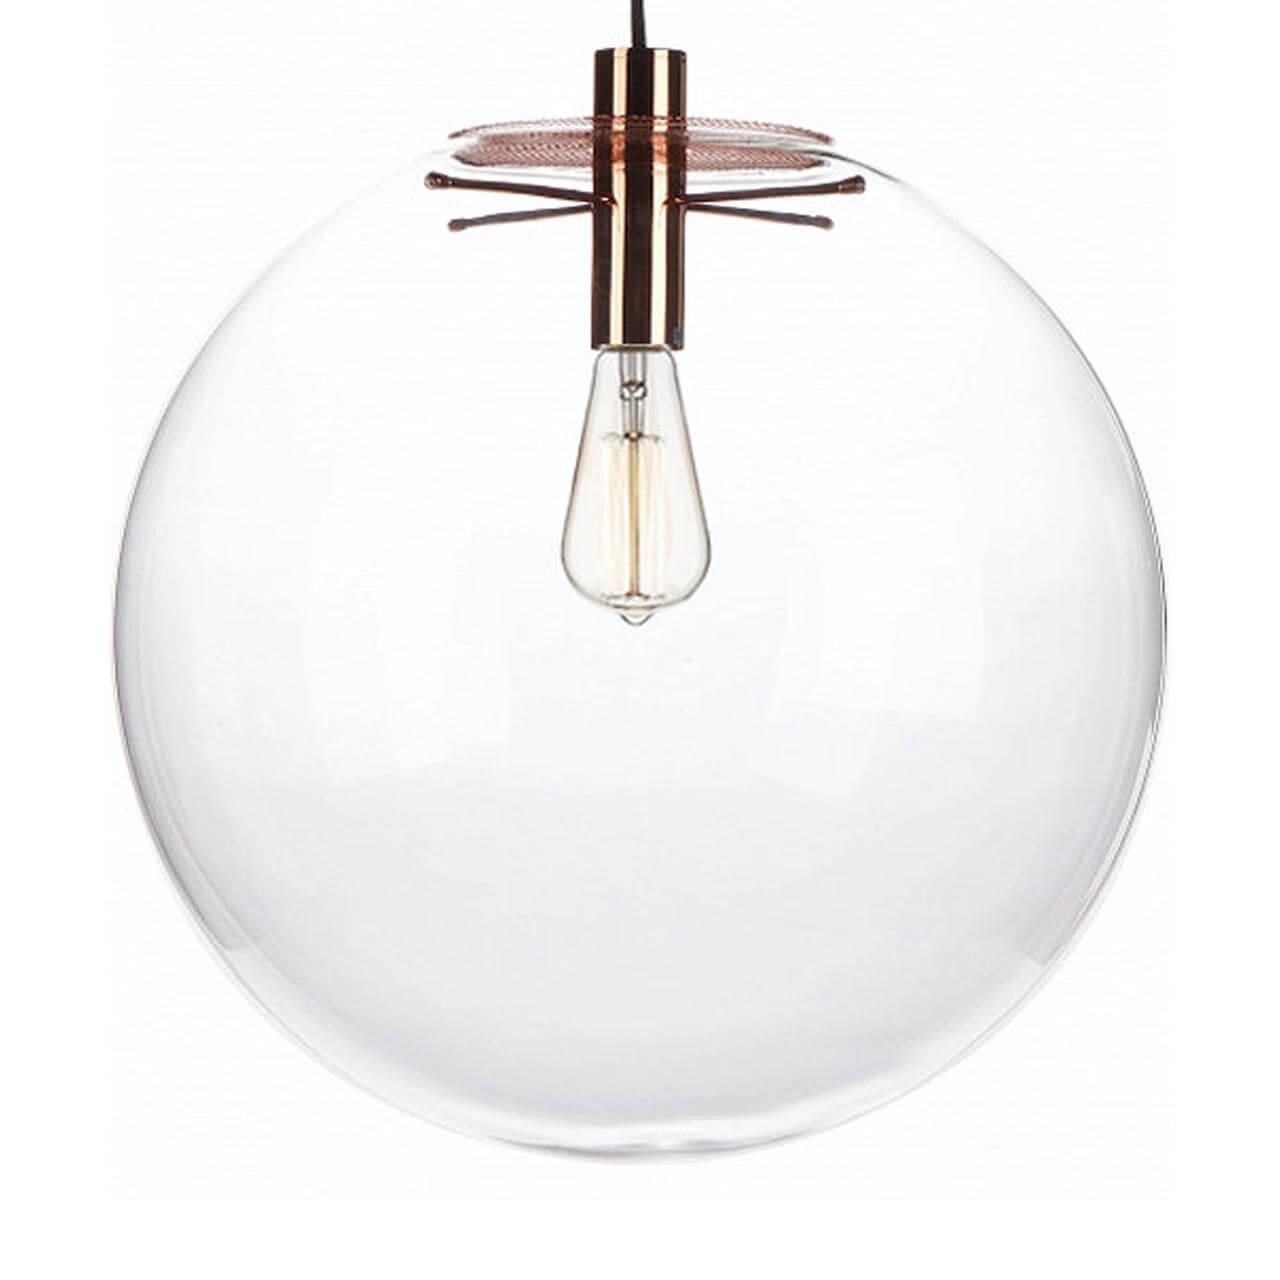 цена на Светильник Kink Light 07564-35,21 Меркурий